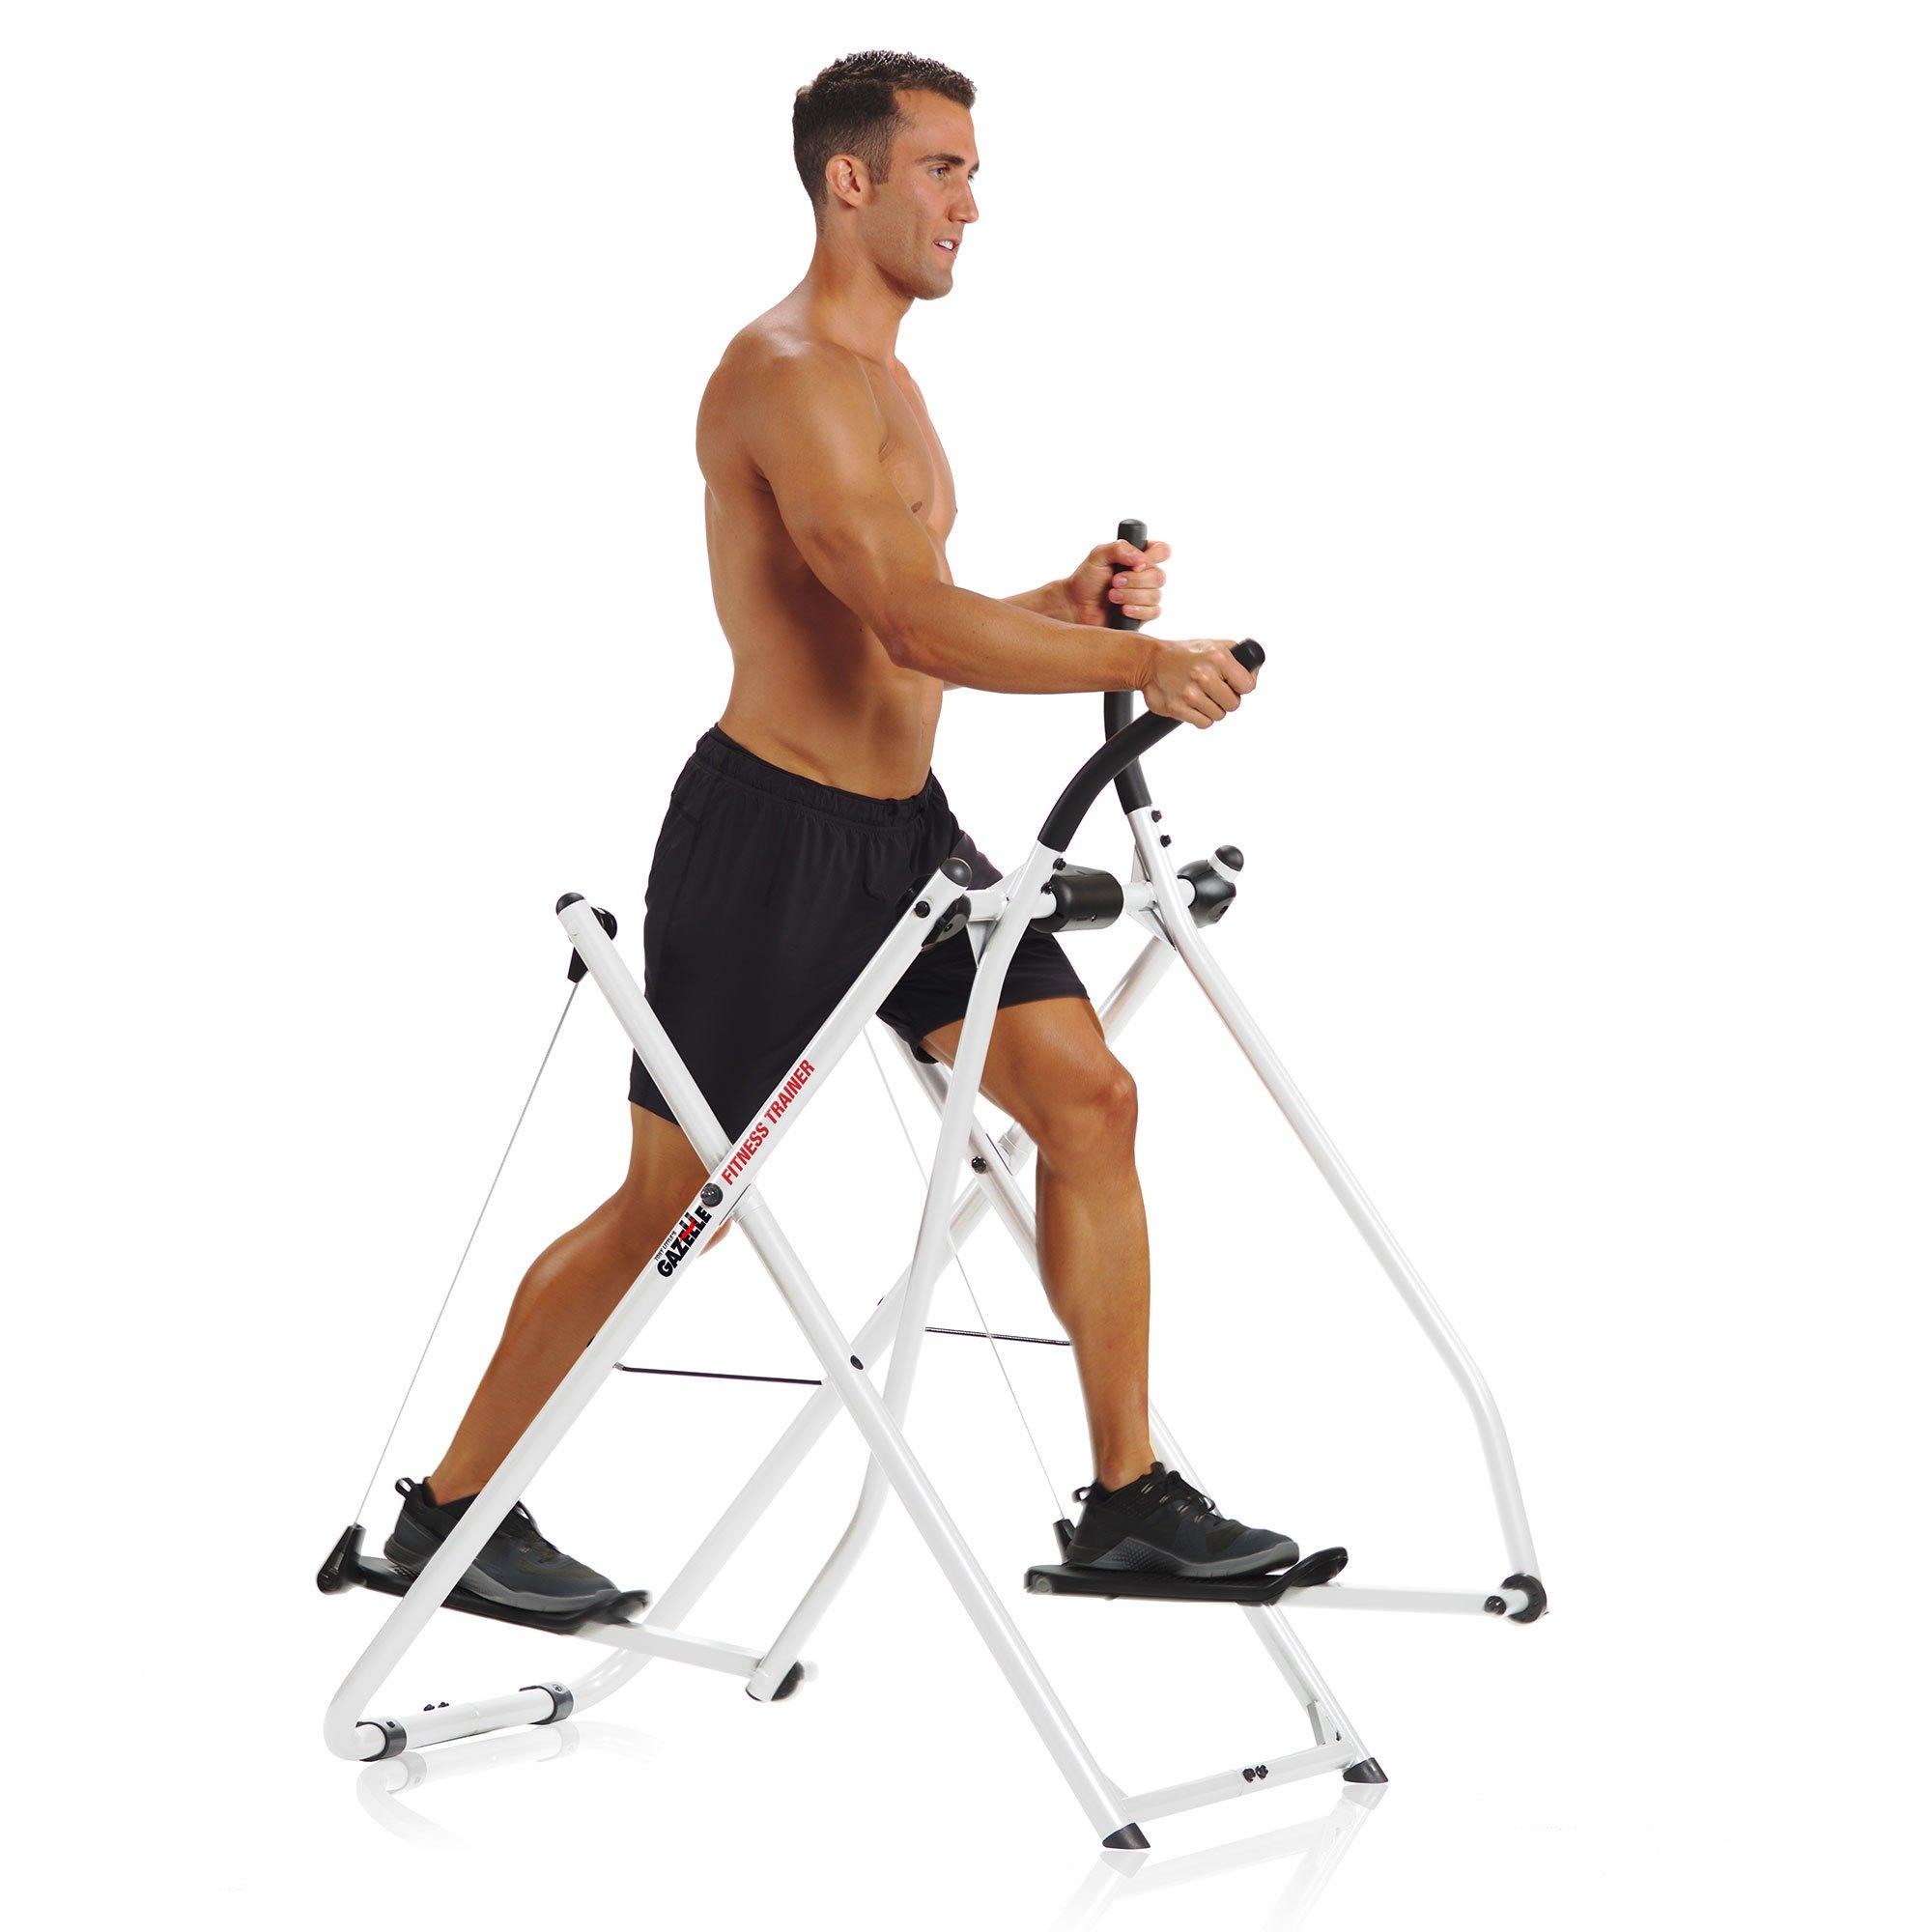 Gazelle Fitness Light Folding Home Gym Cardio Workout